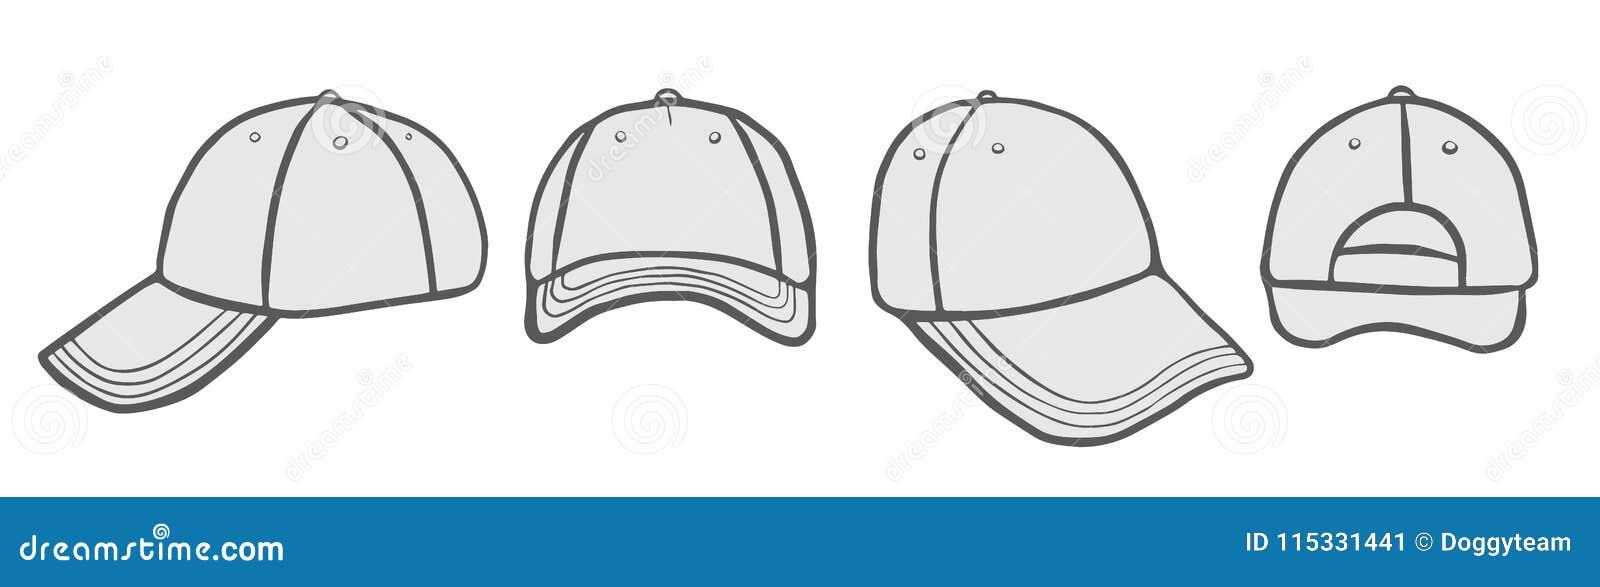 fe759a43cf9 Cap Vector Template stock vector. Illustration of casual - 115331441